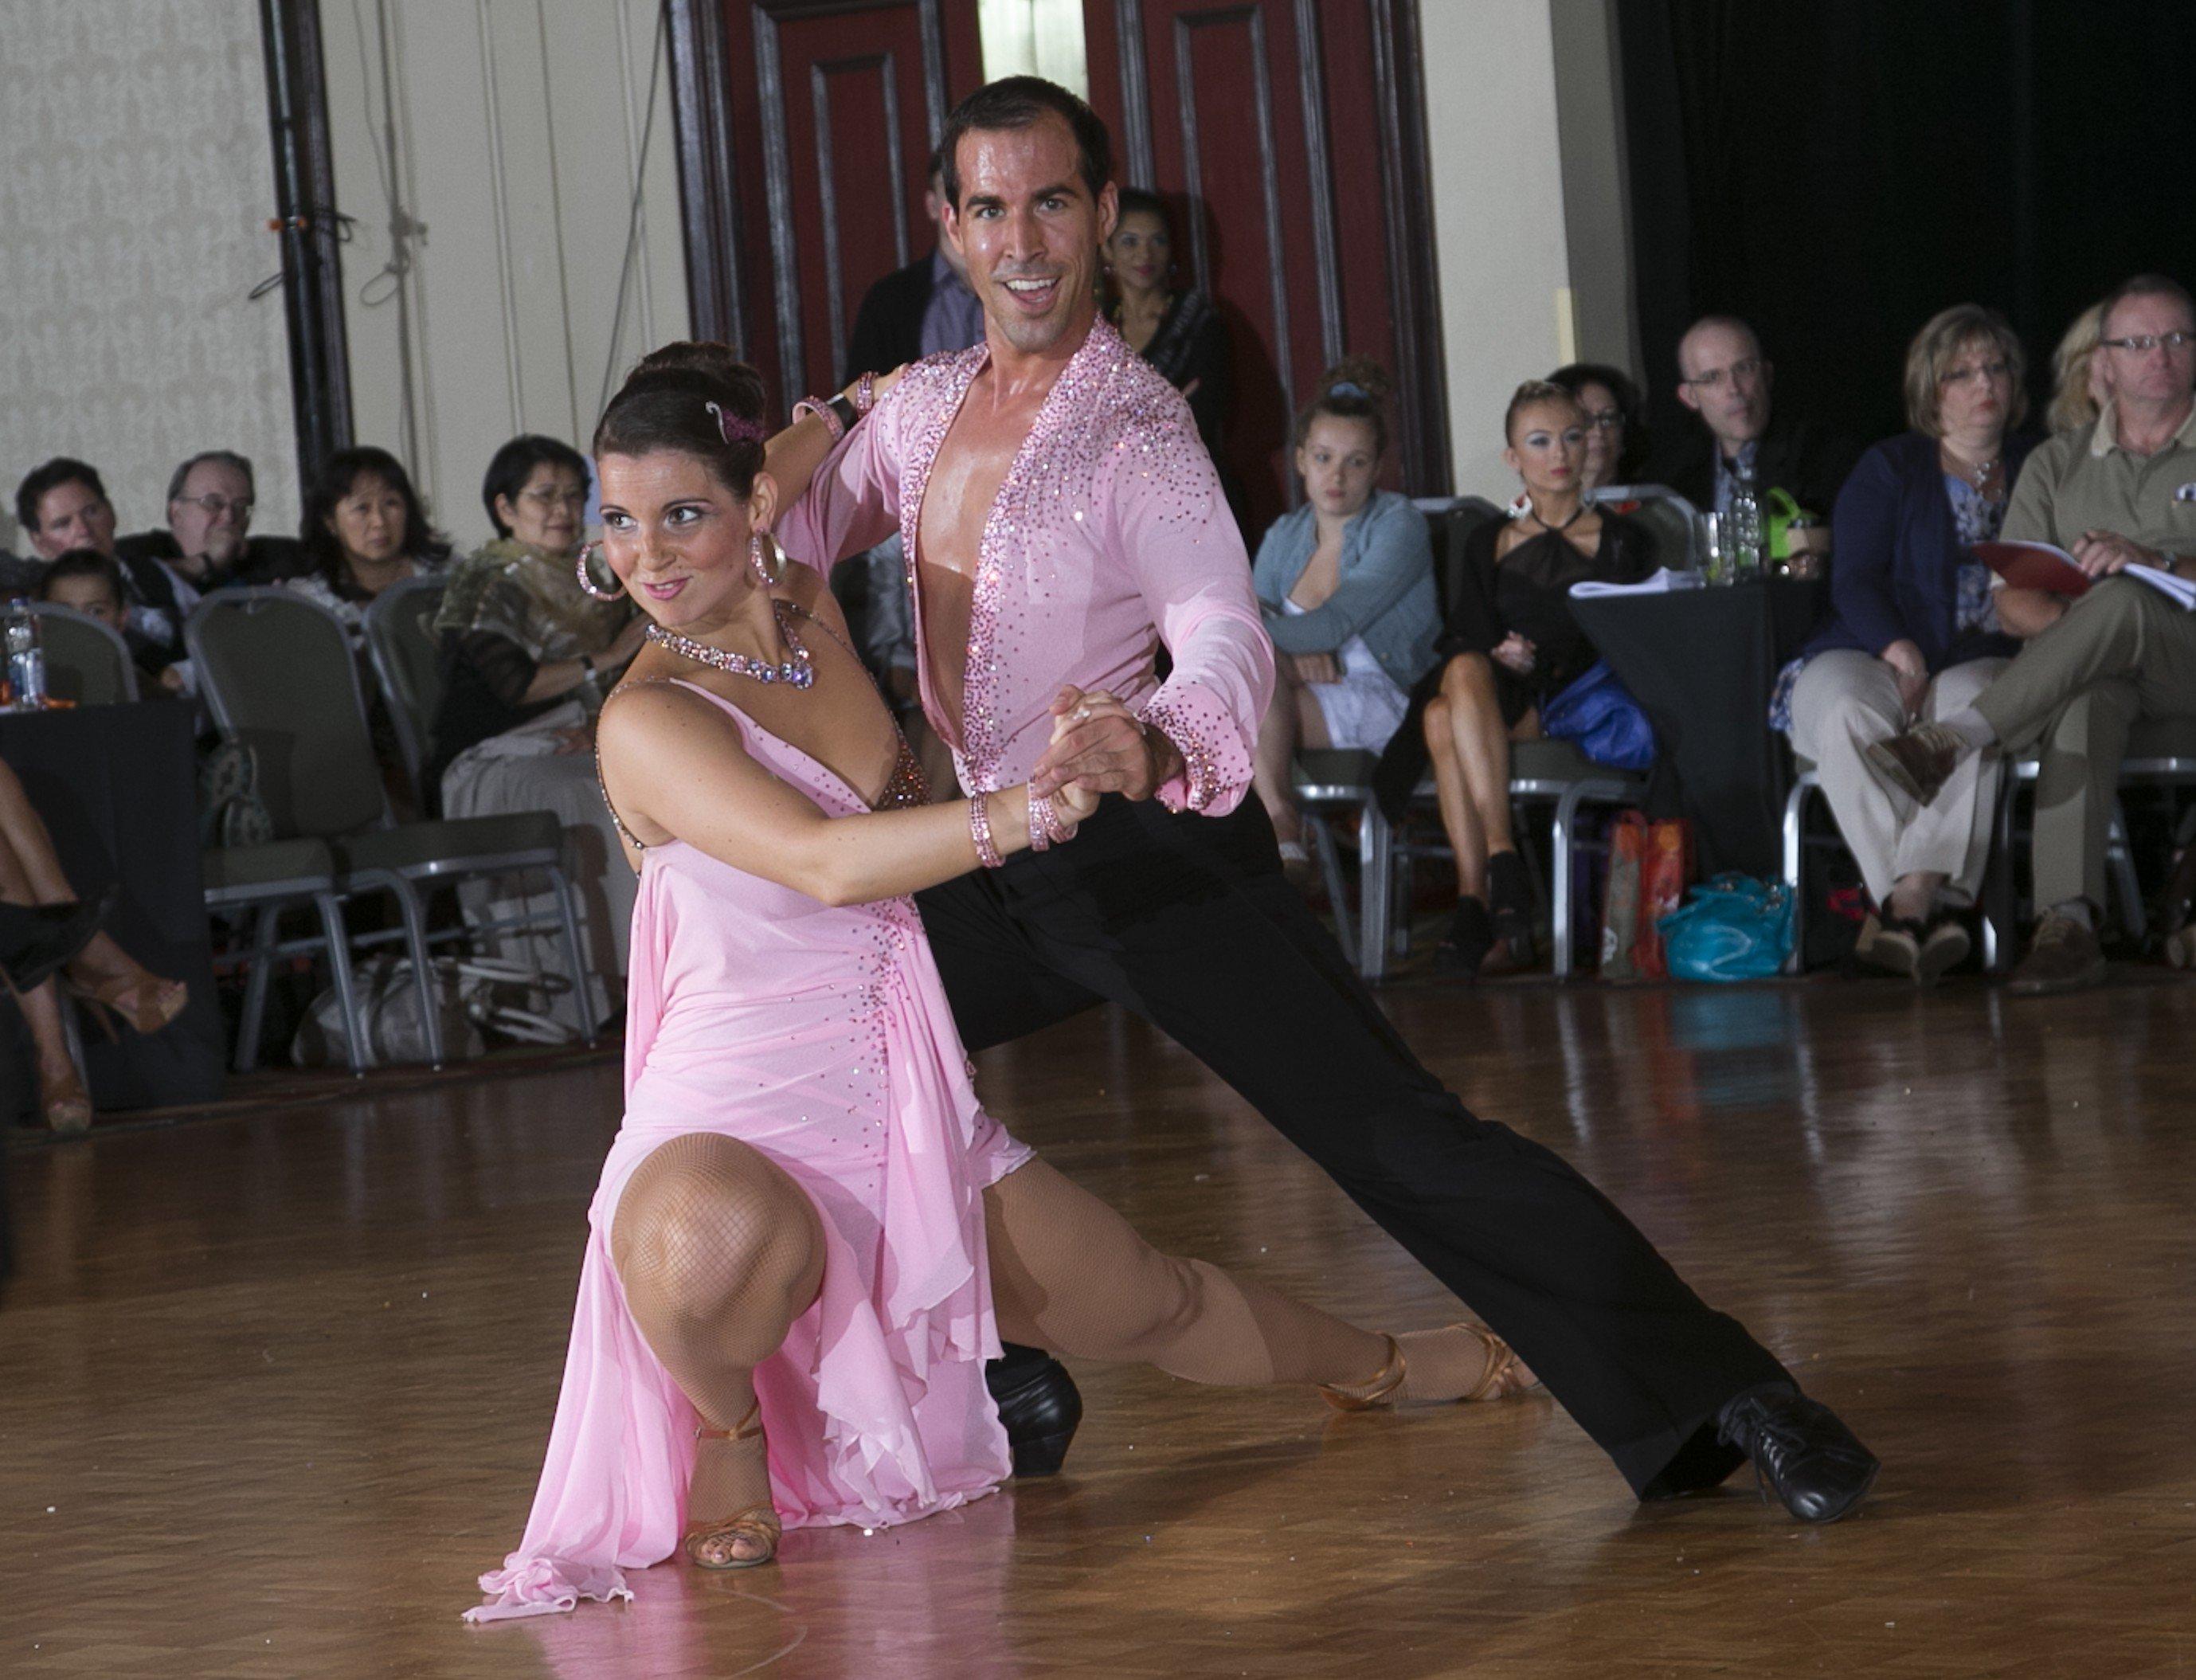 DanseSport 2013: Professionnel Open Rhythm